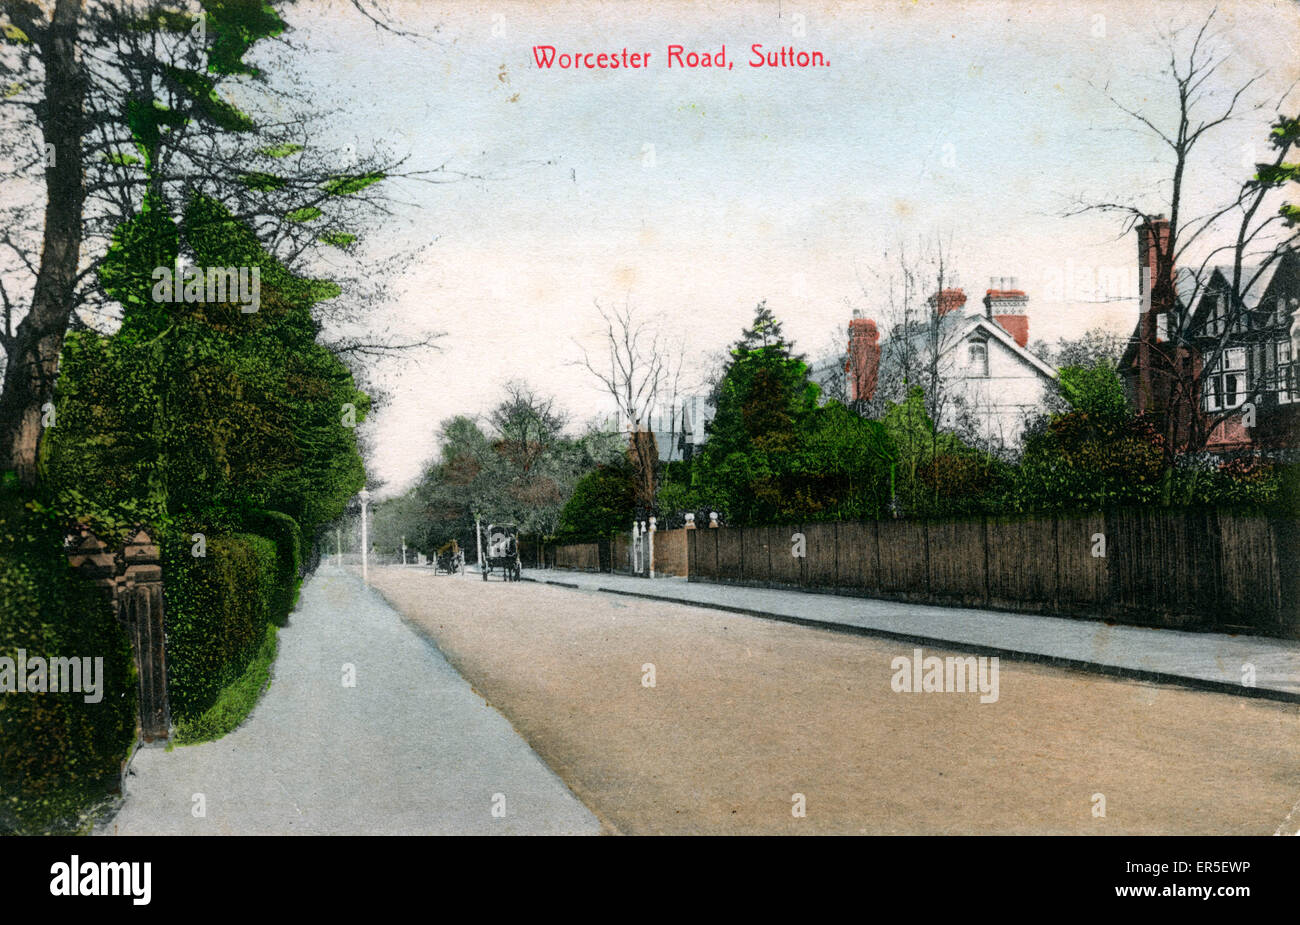 Worcester Road, Sutton, near Croydon, Surrey, England.  1910s - Stock Image